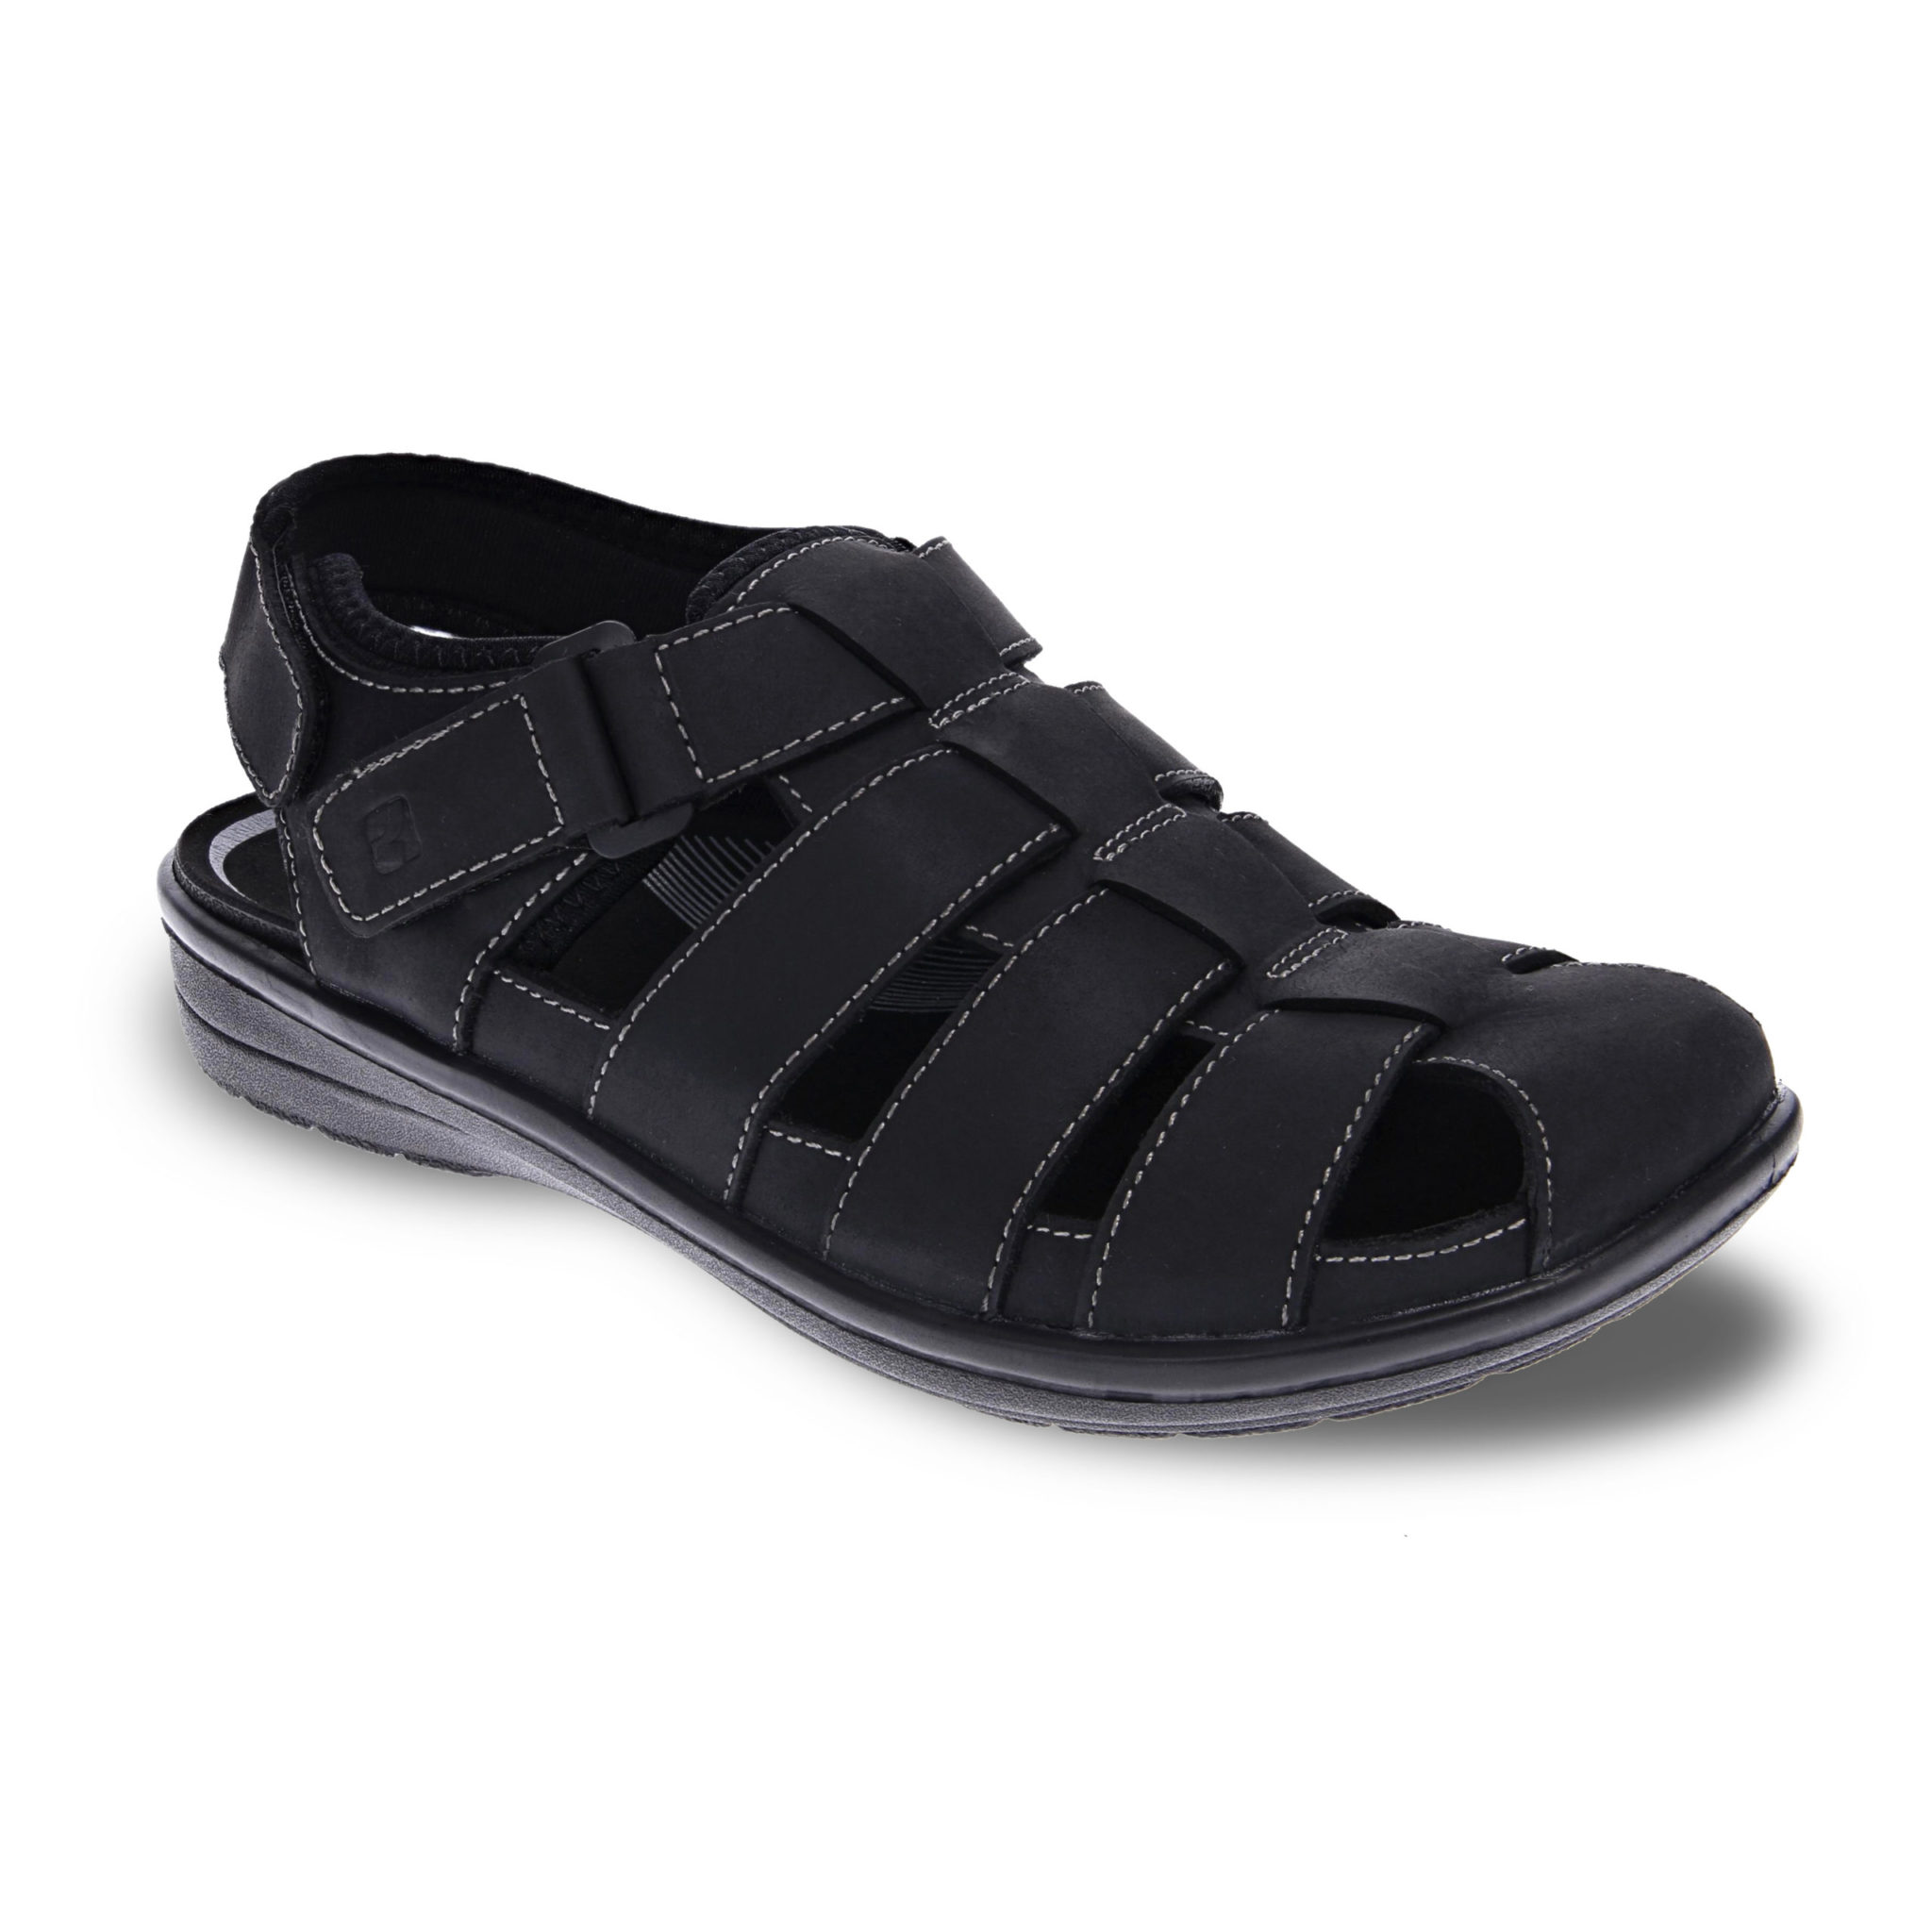 Amsterdam Oiled Black comfort heren sandaal